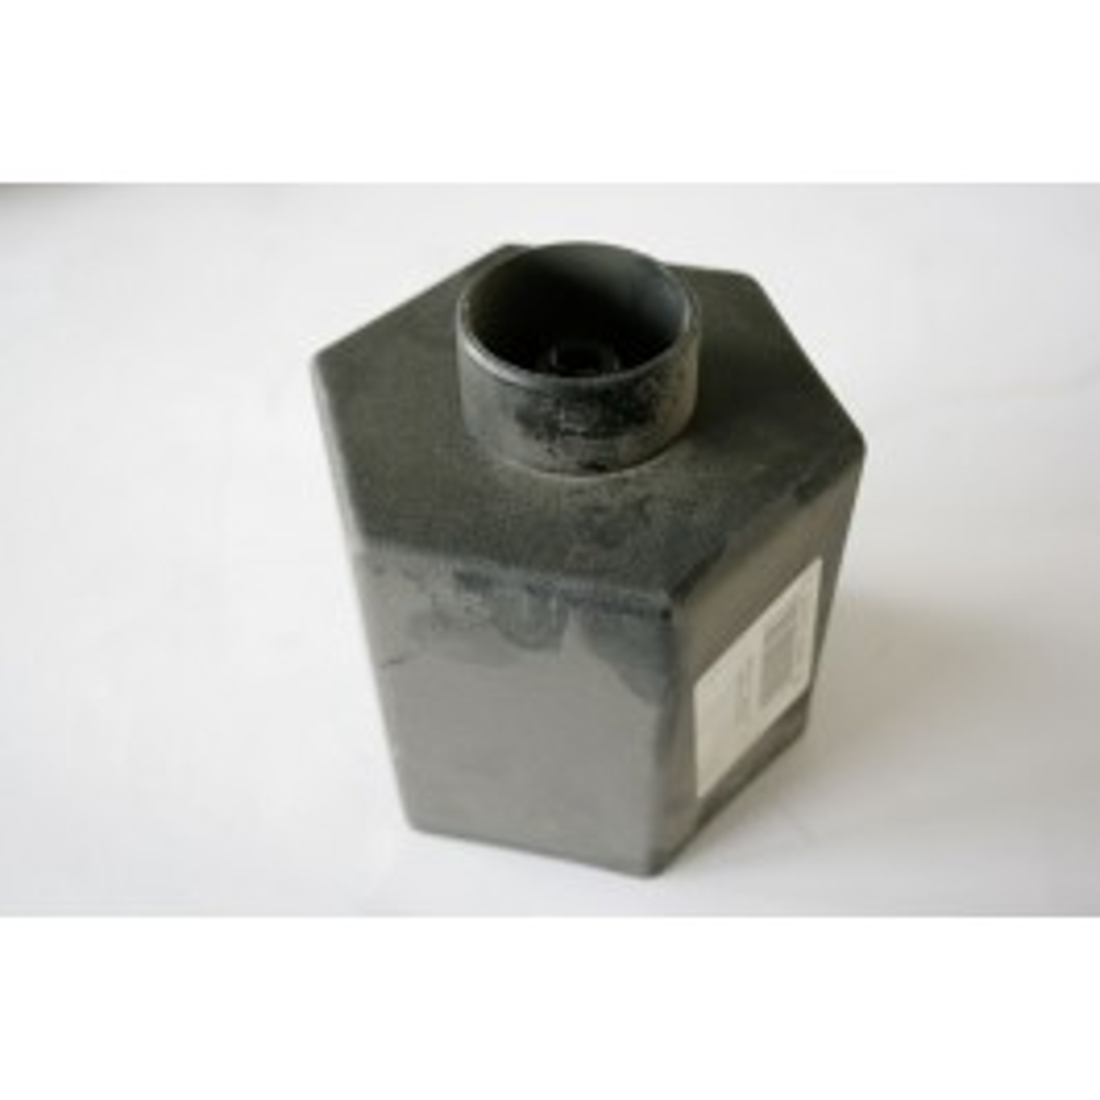 Filterdeckel (unten)